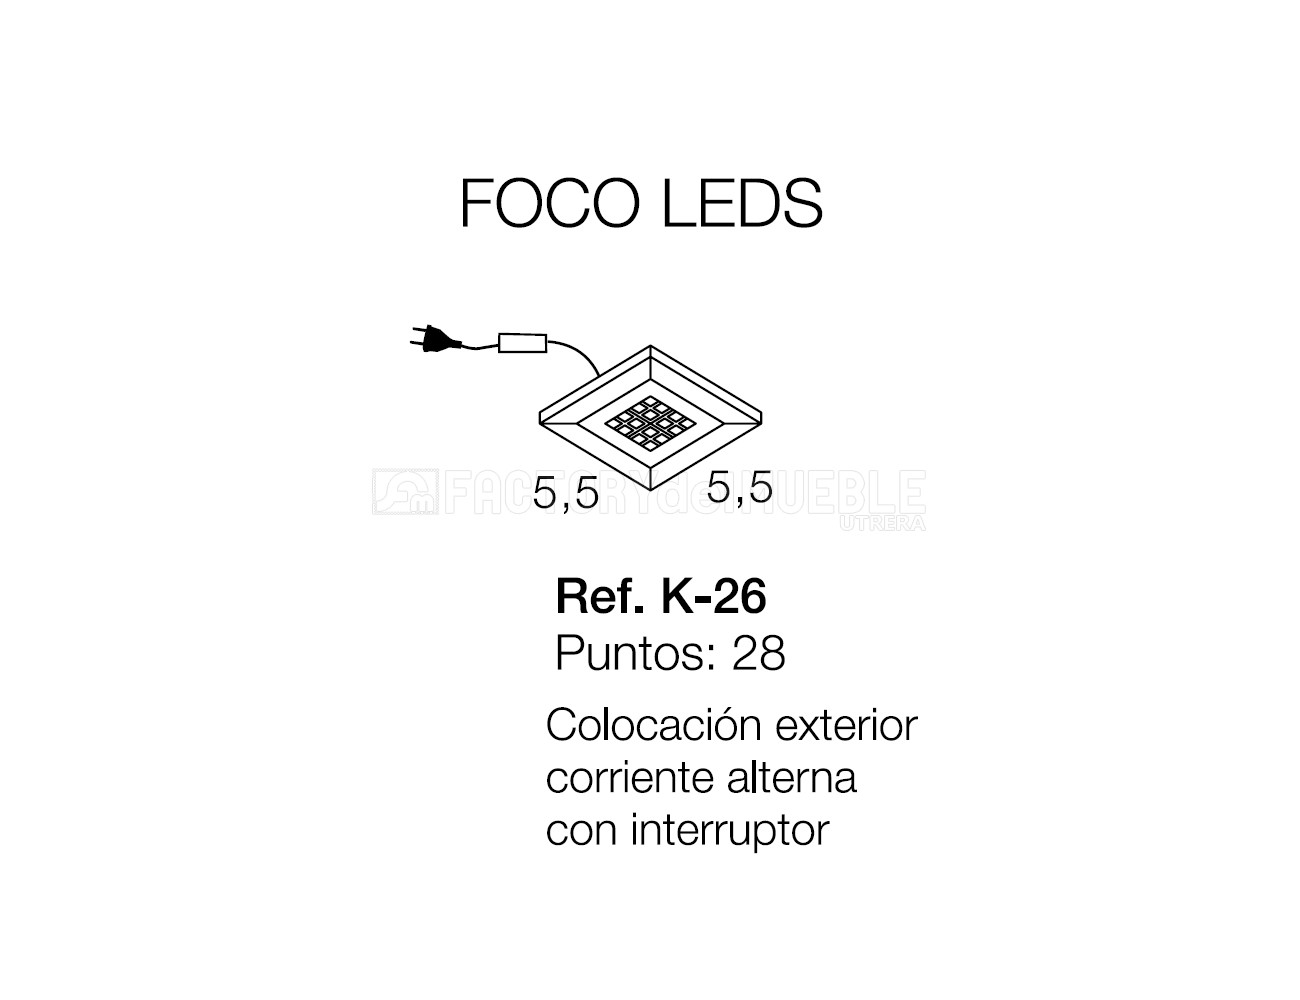 Faco led k 26